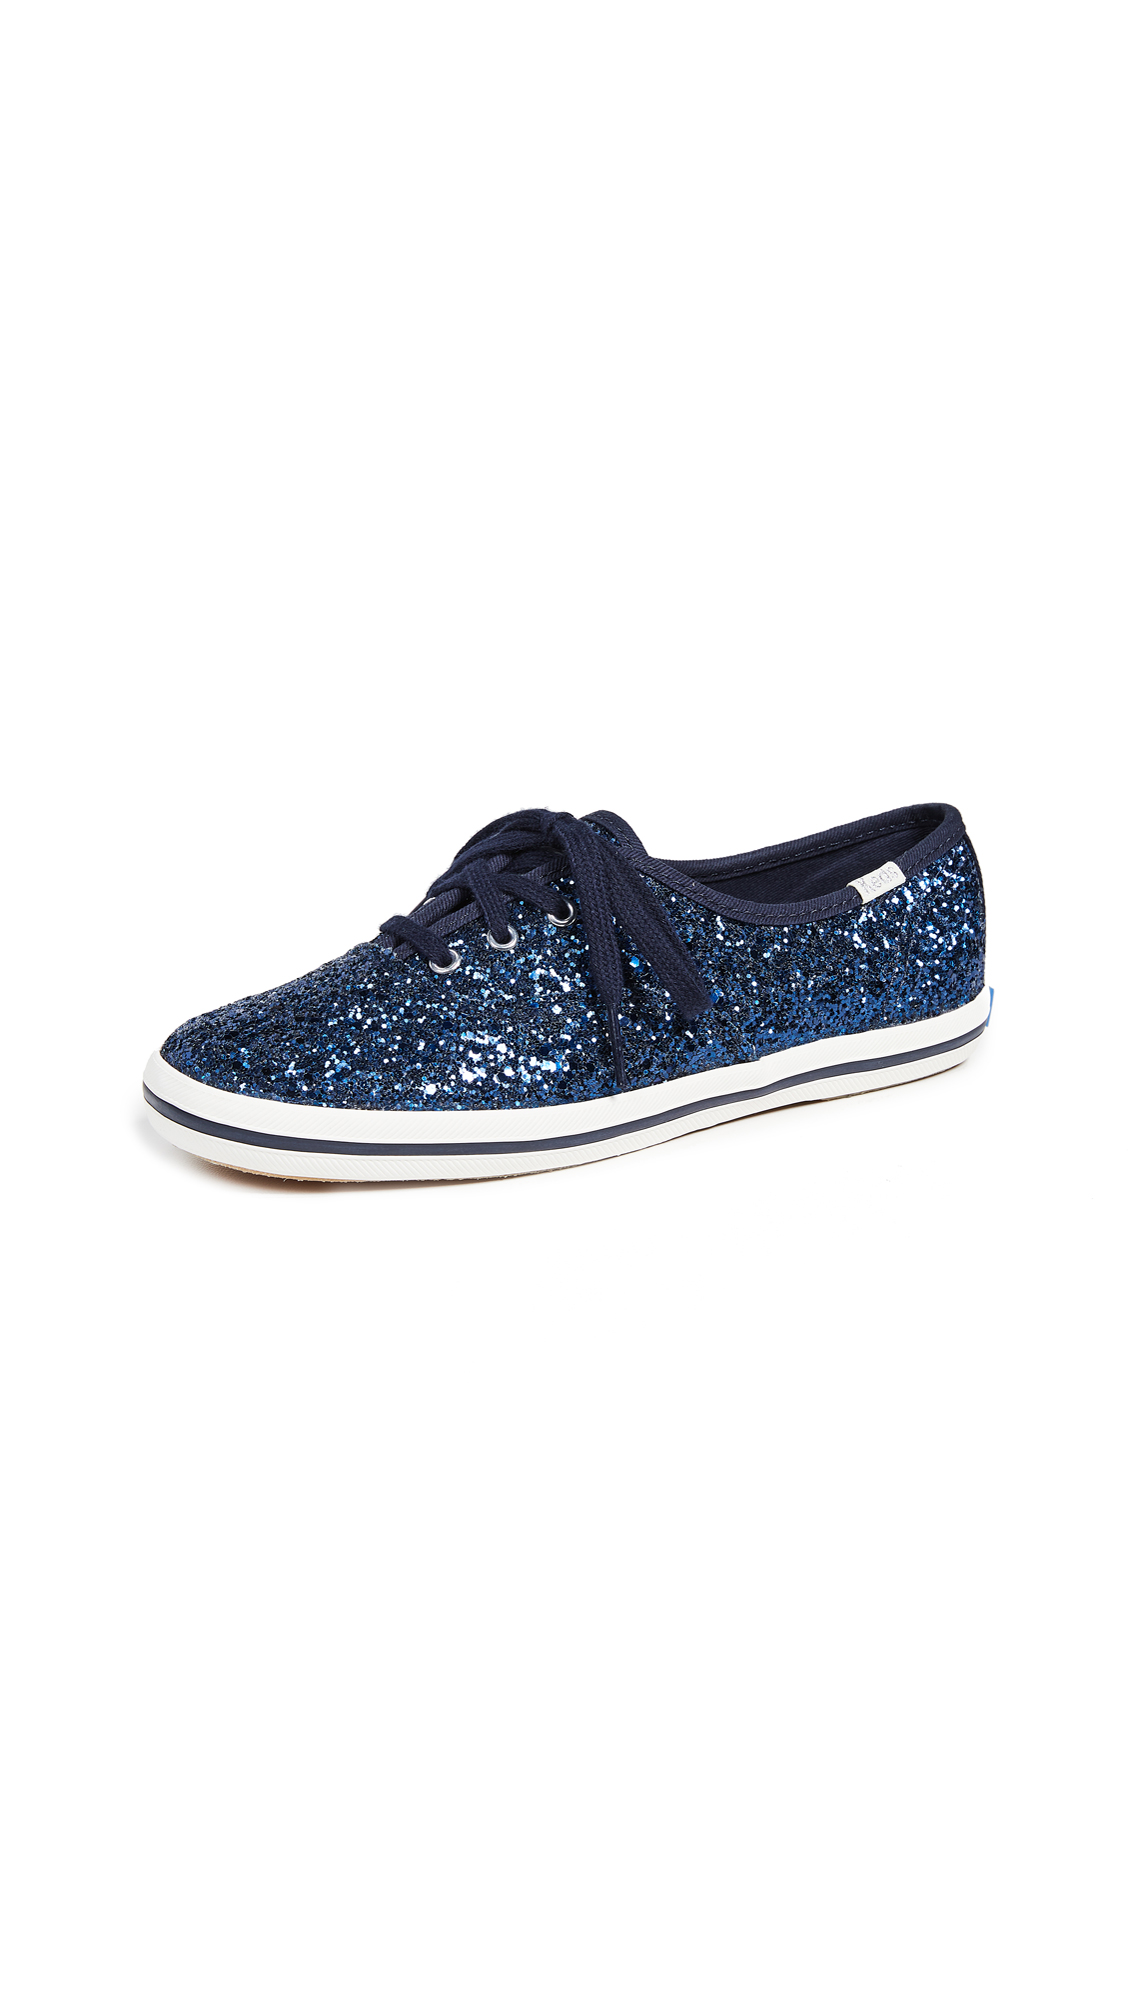 Keds x Kate Spade Champion Sneakers - Navy